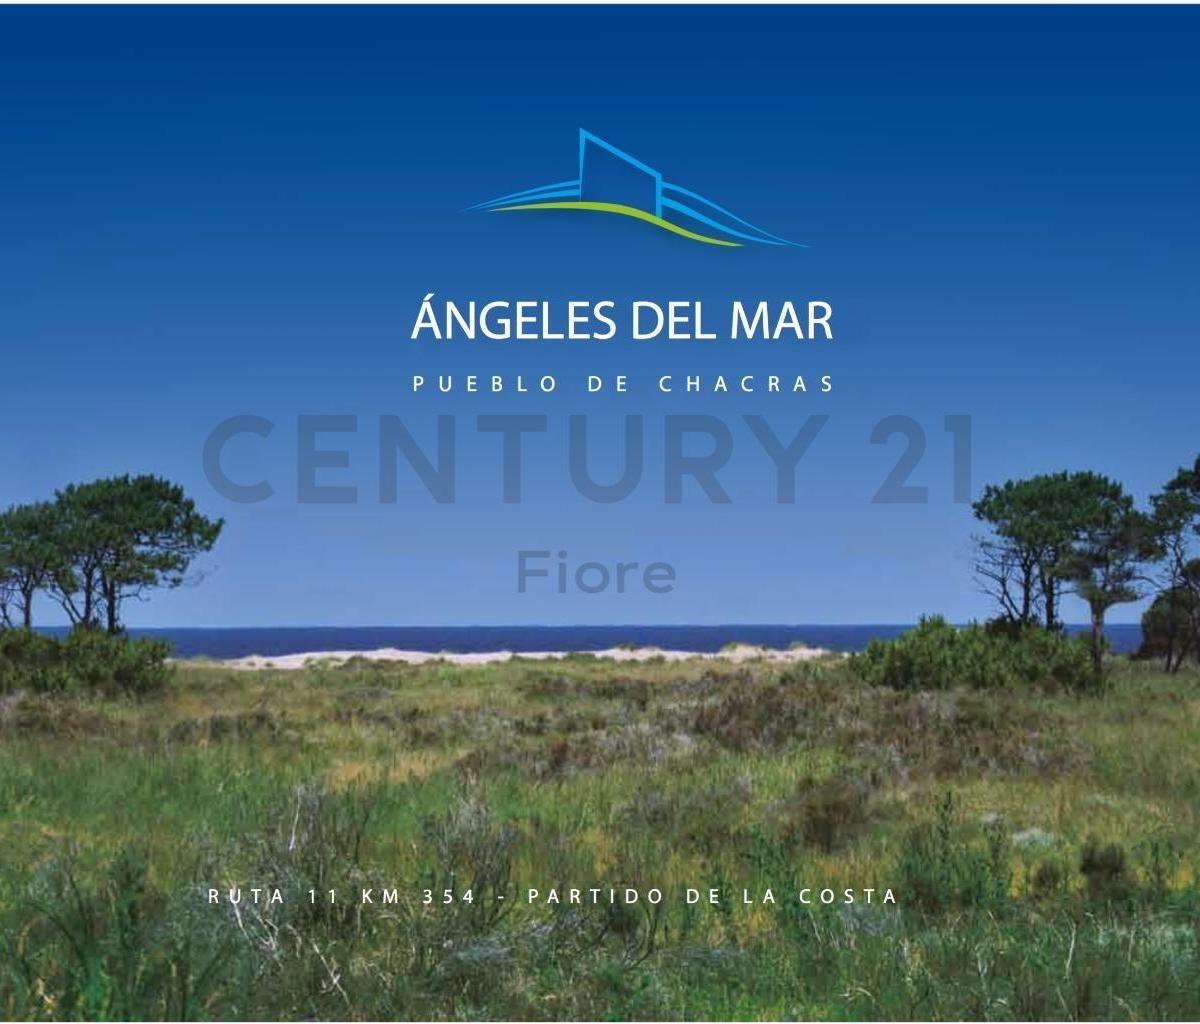 pre-venta de lotes en chacras  angeles del mar  ruta 11 km 355